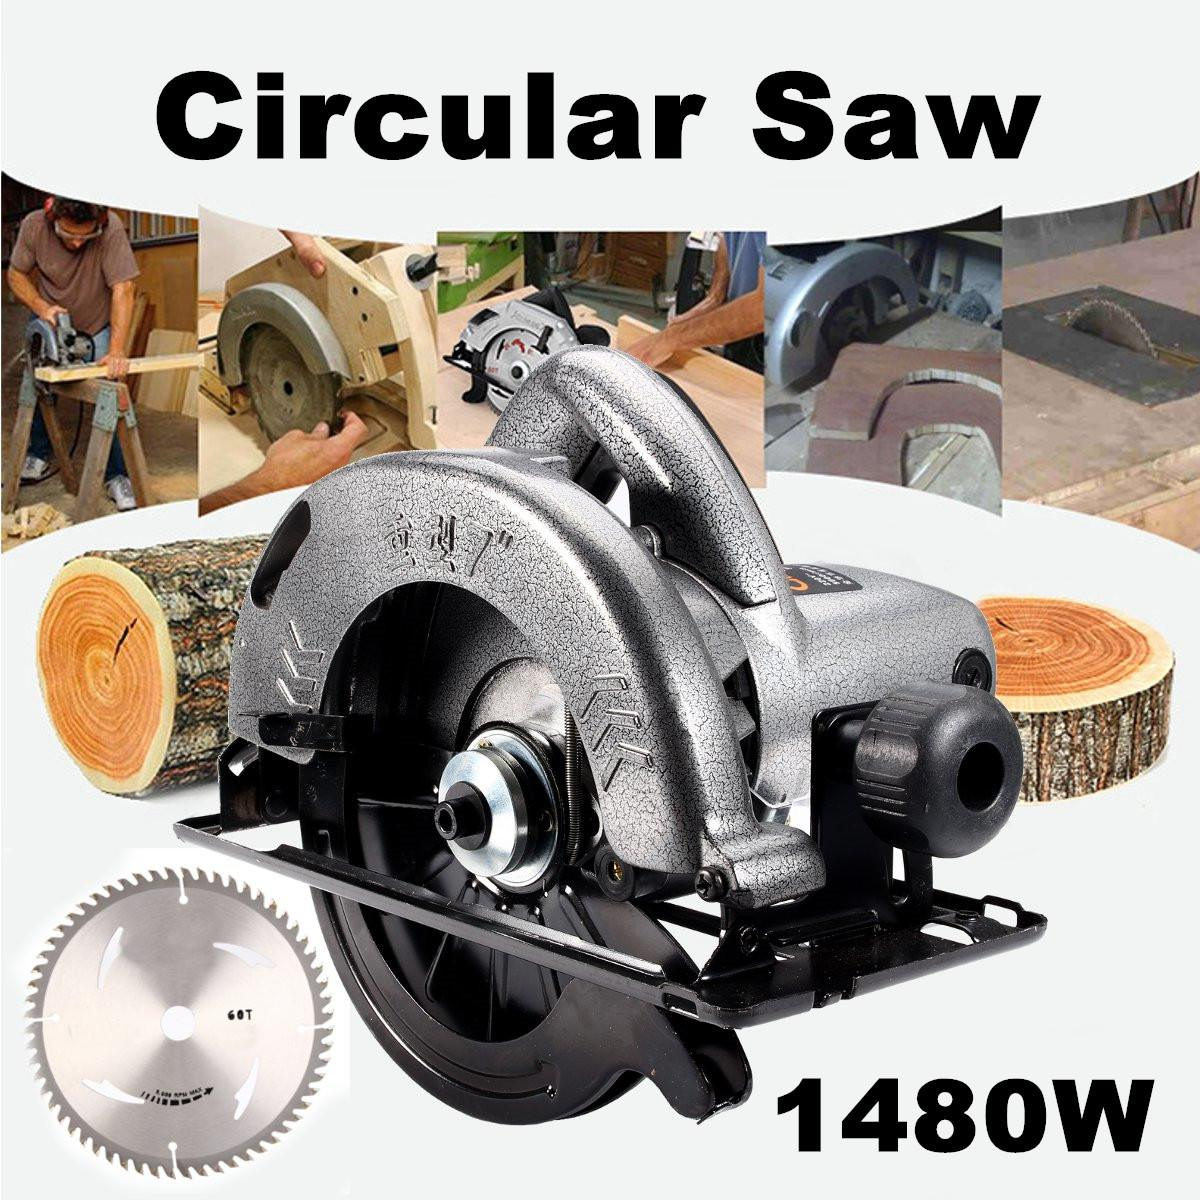 1480W Electric Corded Circular Saw Wood Cutting Tool Multi-function Cutting Machine Woodworking DIY Model Household Circular Saw